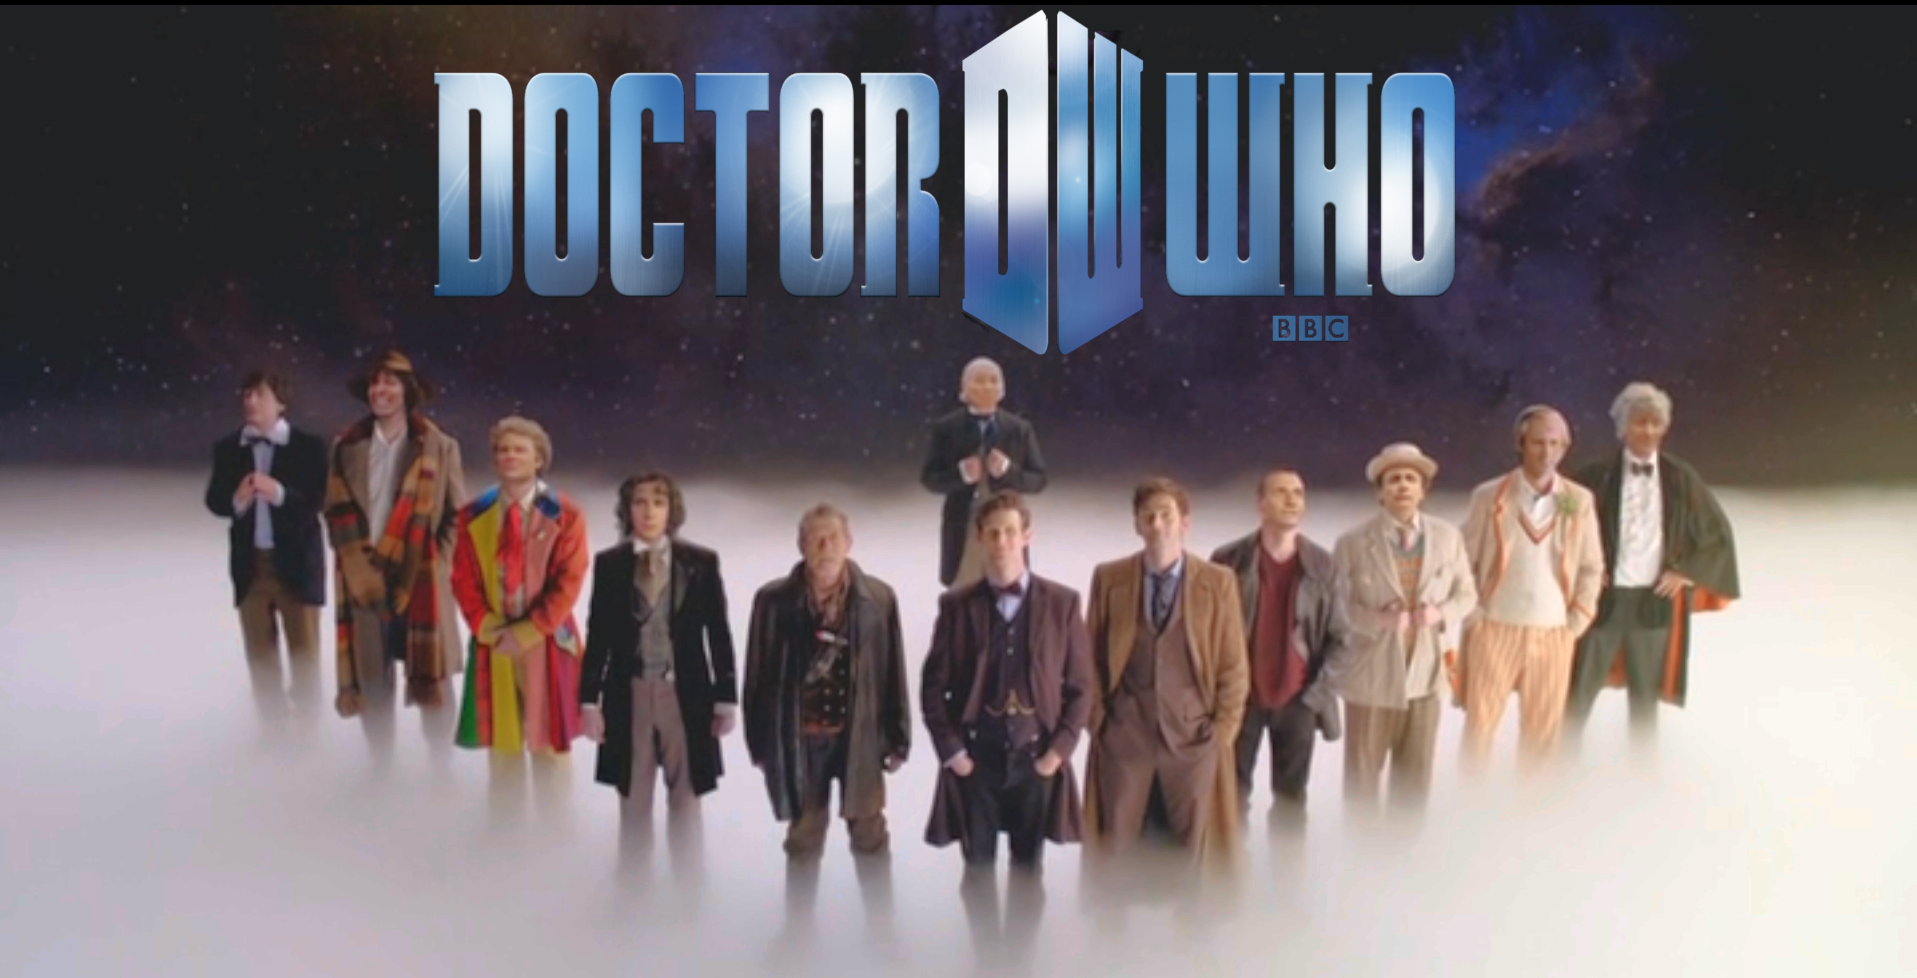 Doctor Who 12th Doctor Wallpaper - WallpaperSafari  All 12 Doctors Wallpaper